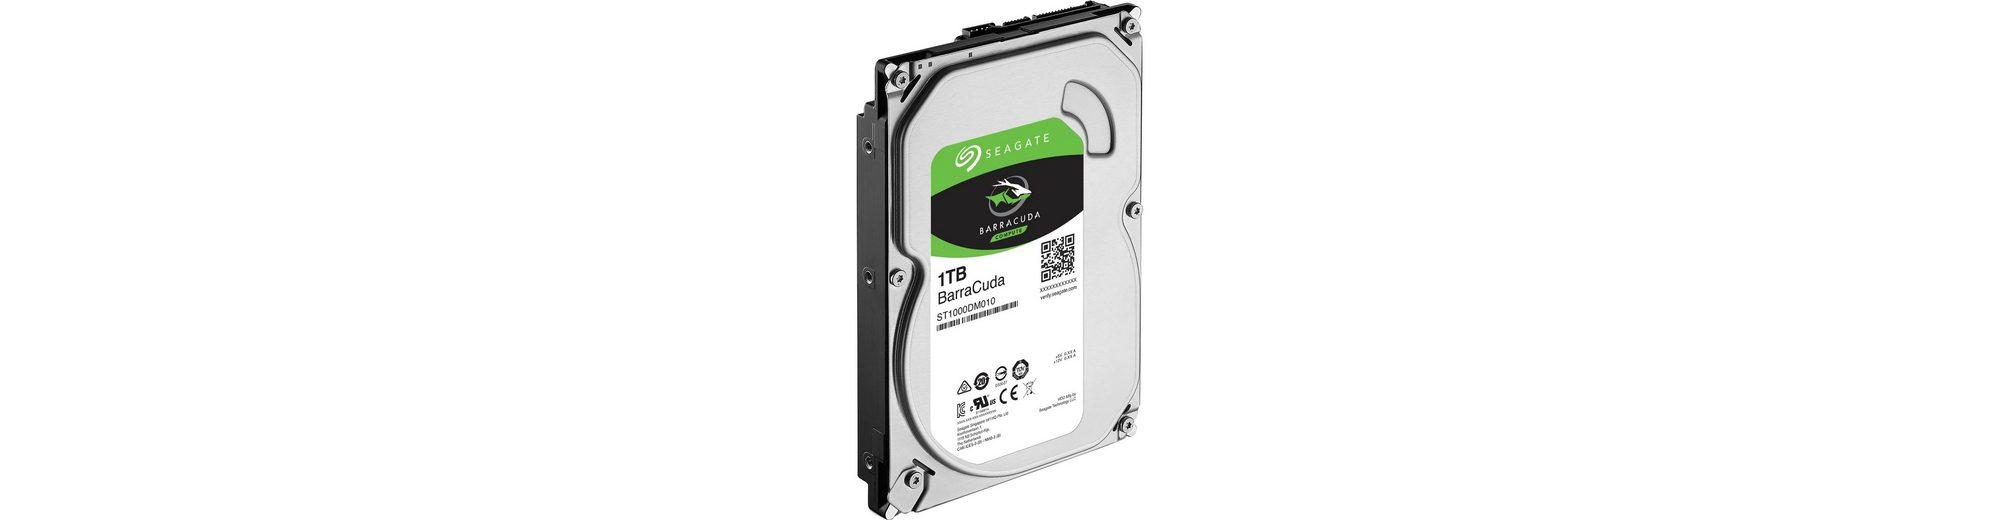 Seagate Festplatte »ST1000DM010 1 TB«